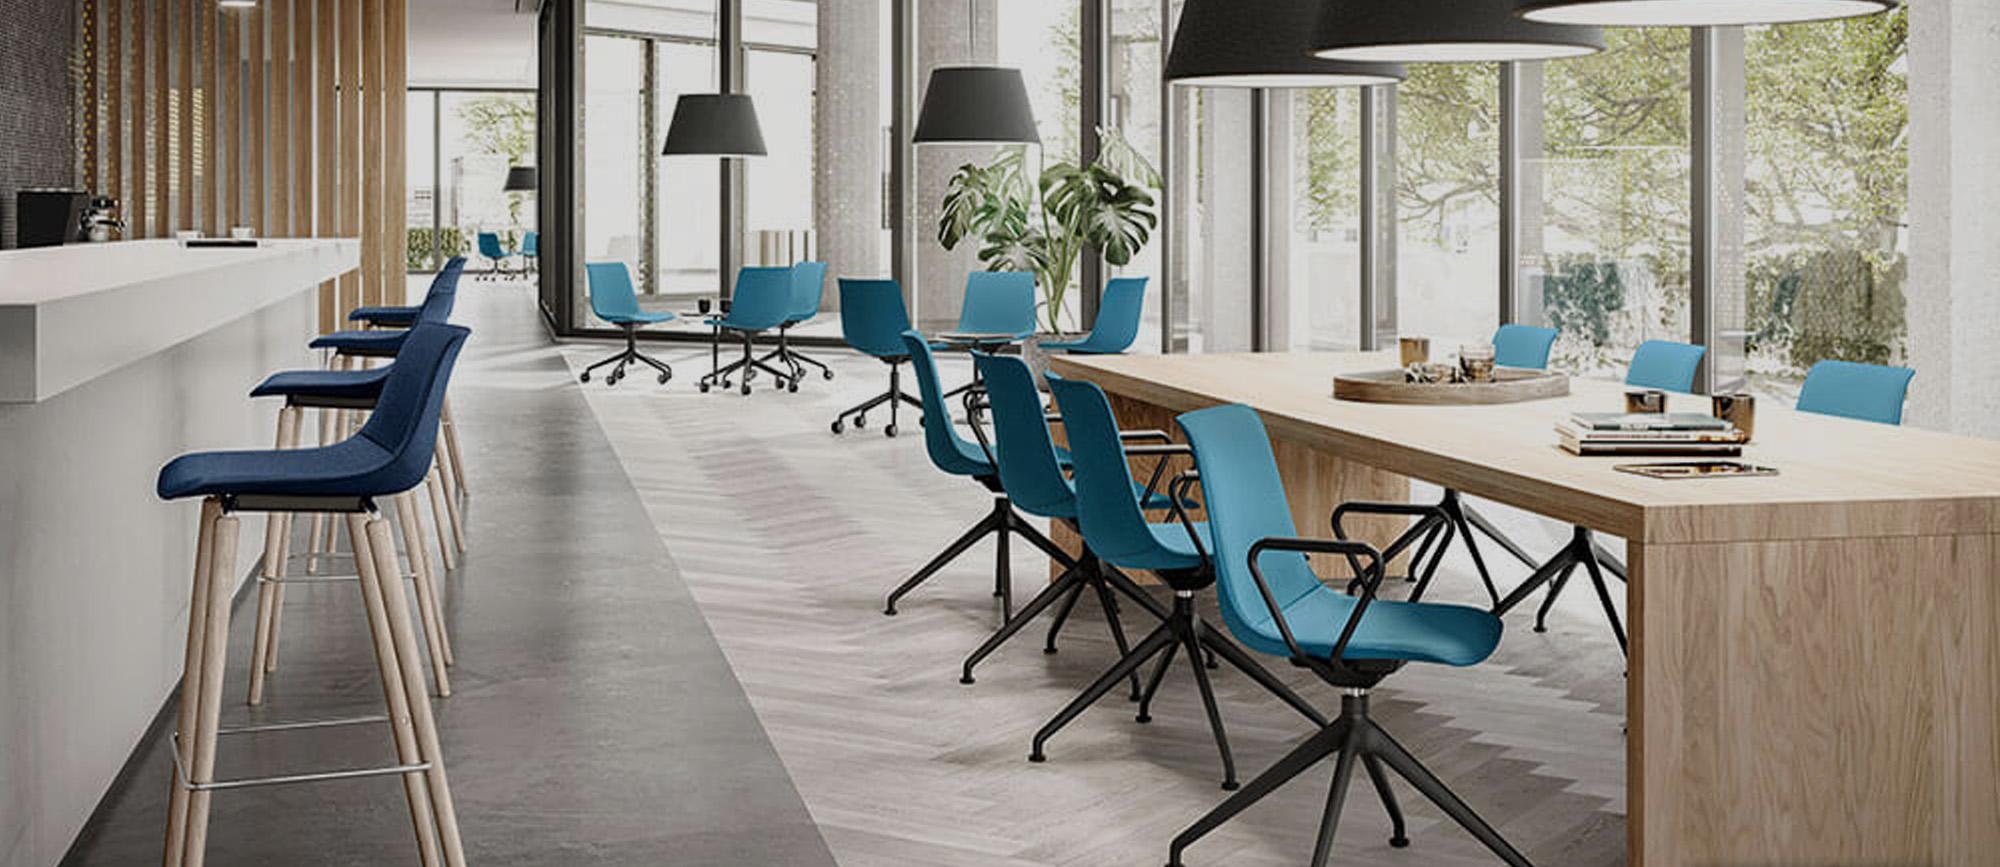 Interstuhl shuffle office chair range